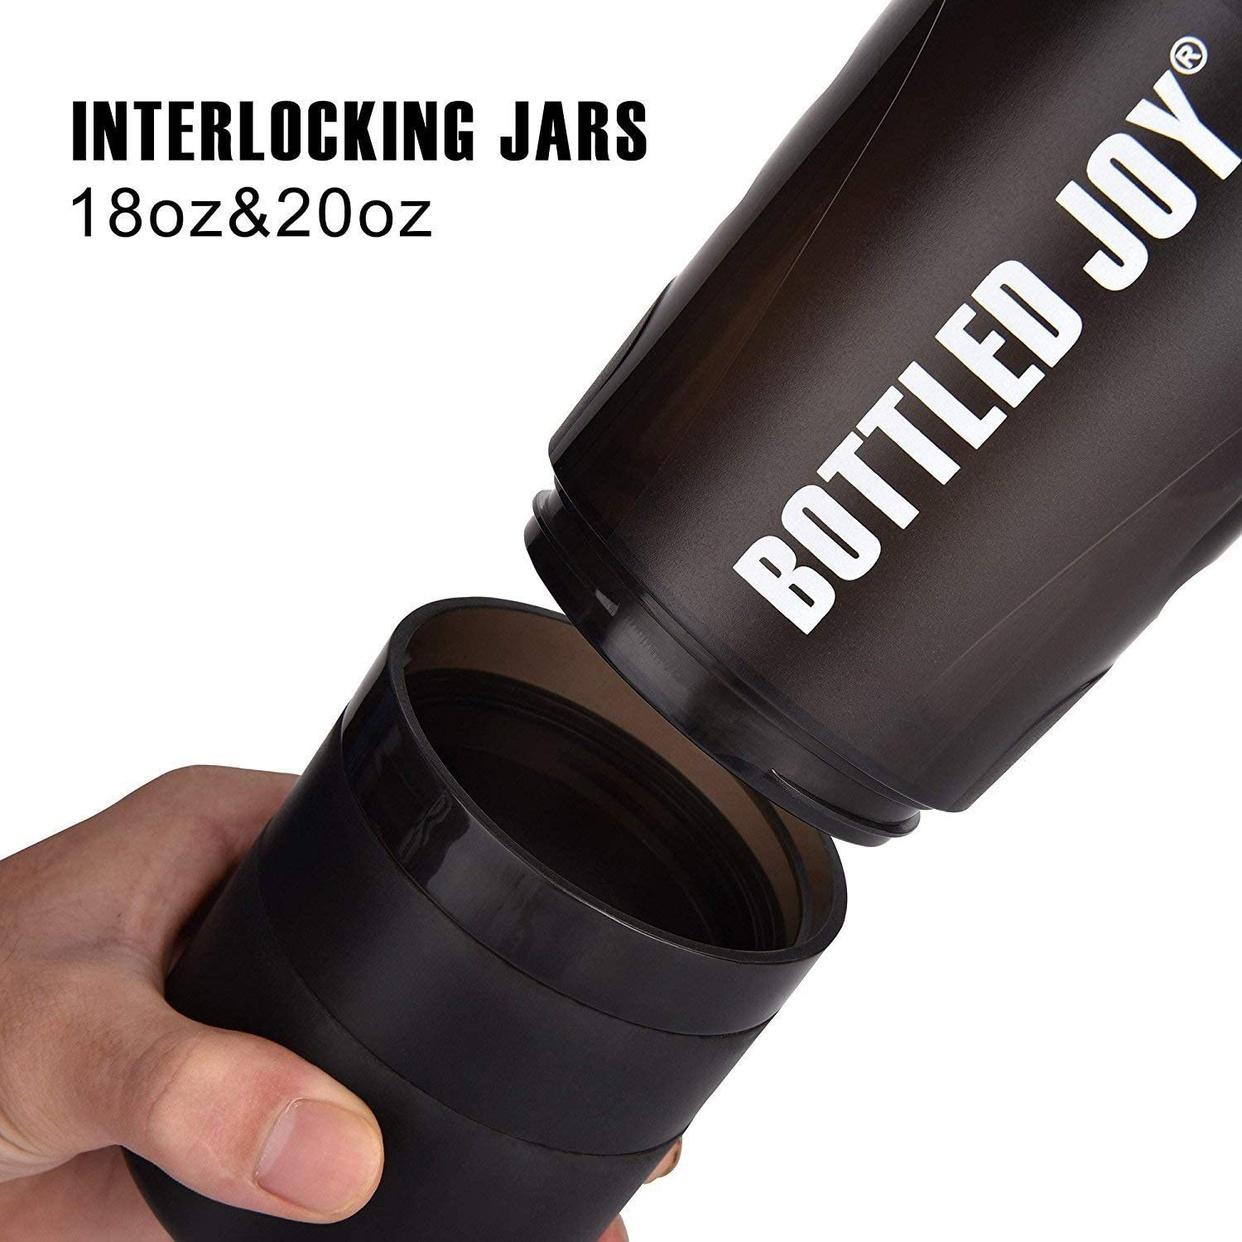 BOTTLED JOY(ボトルジョイ) プロテイン シェイカー FS-B001Bの商品画像4